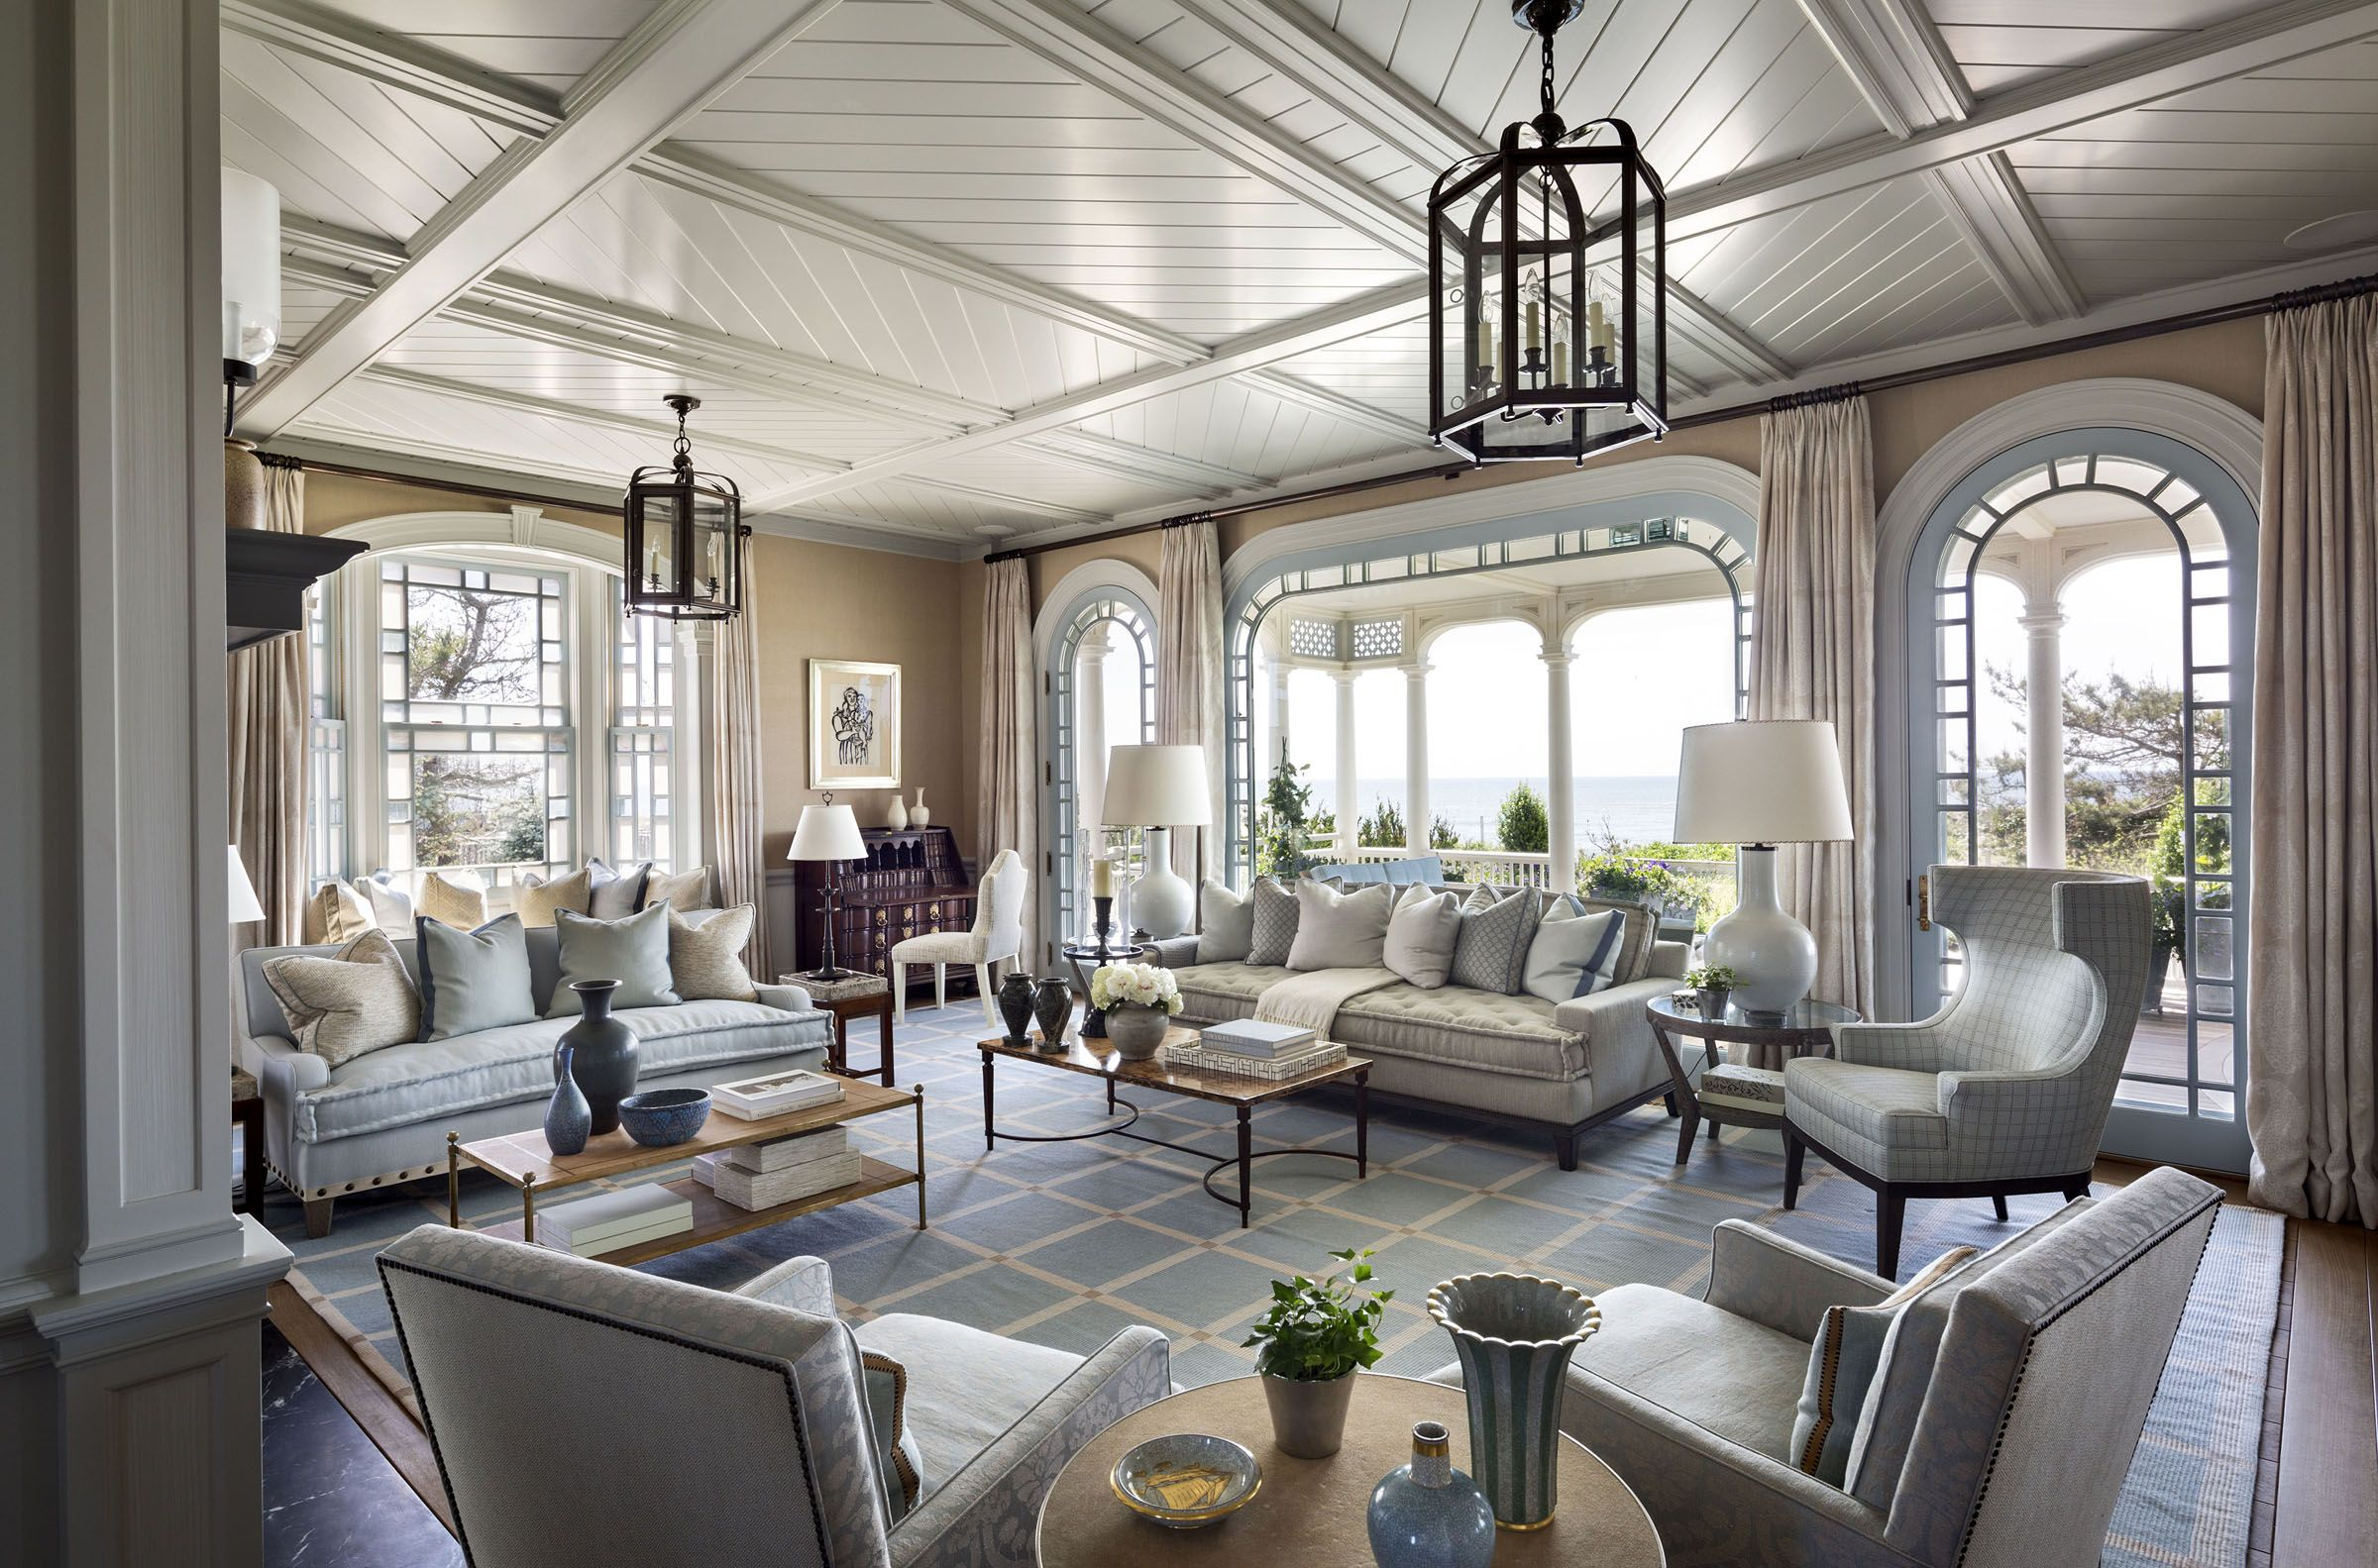 Robert A.M. Stern Architects, LLP | Interior Design | Pinterest ...